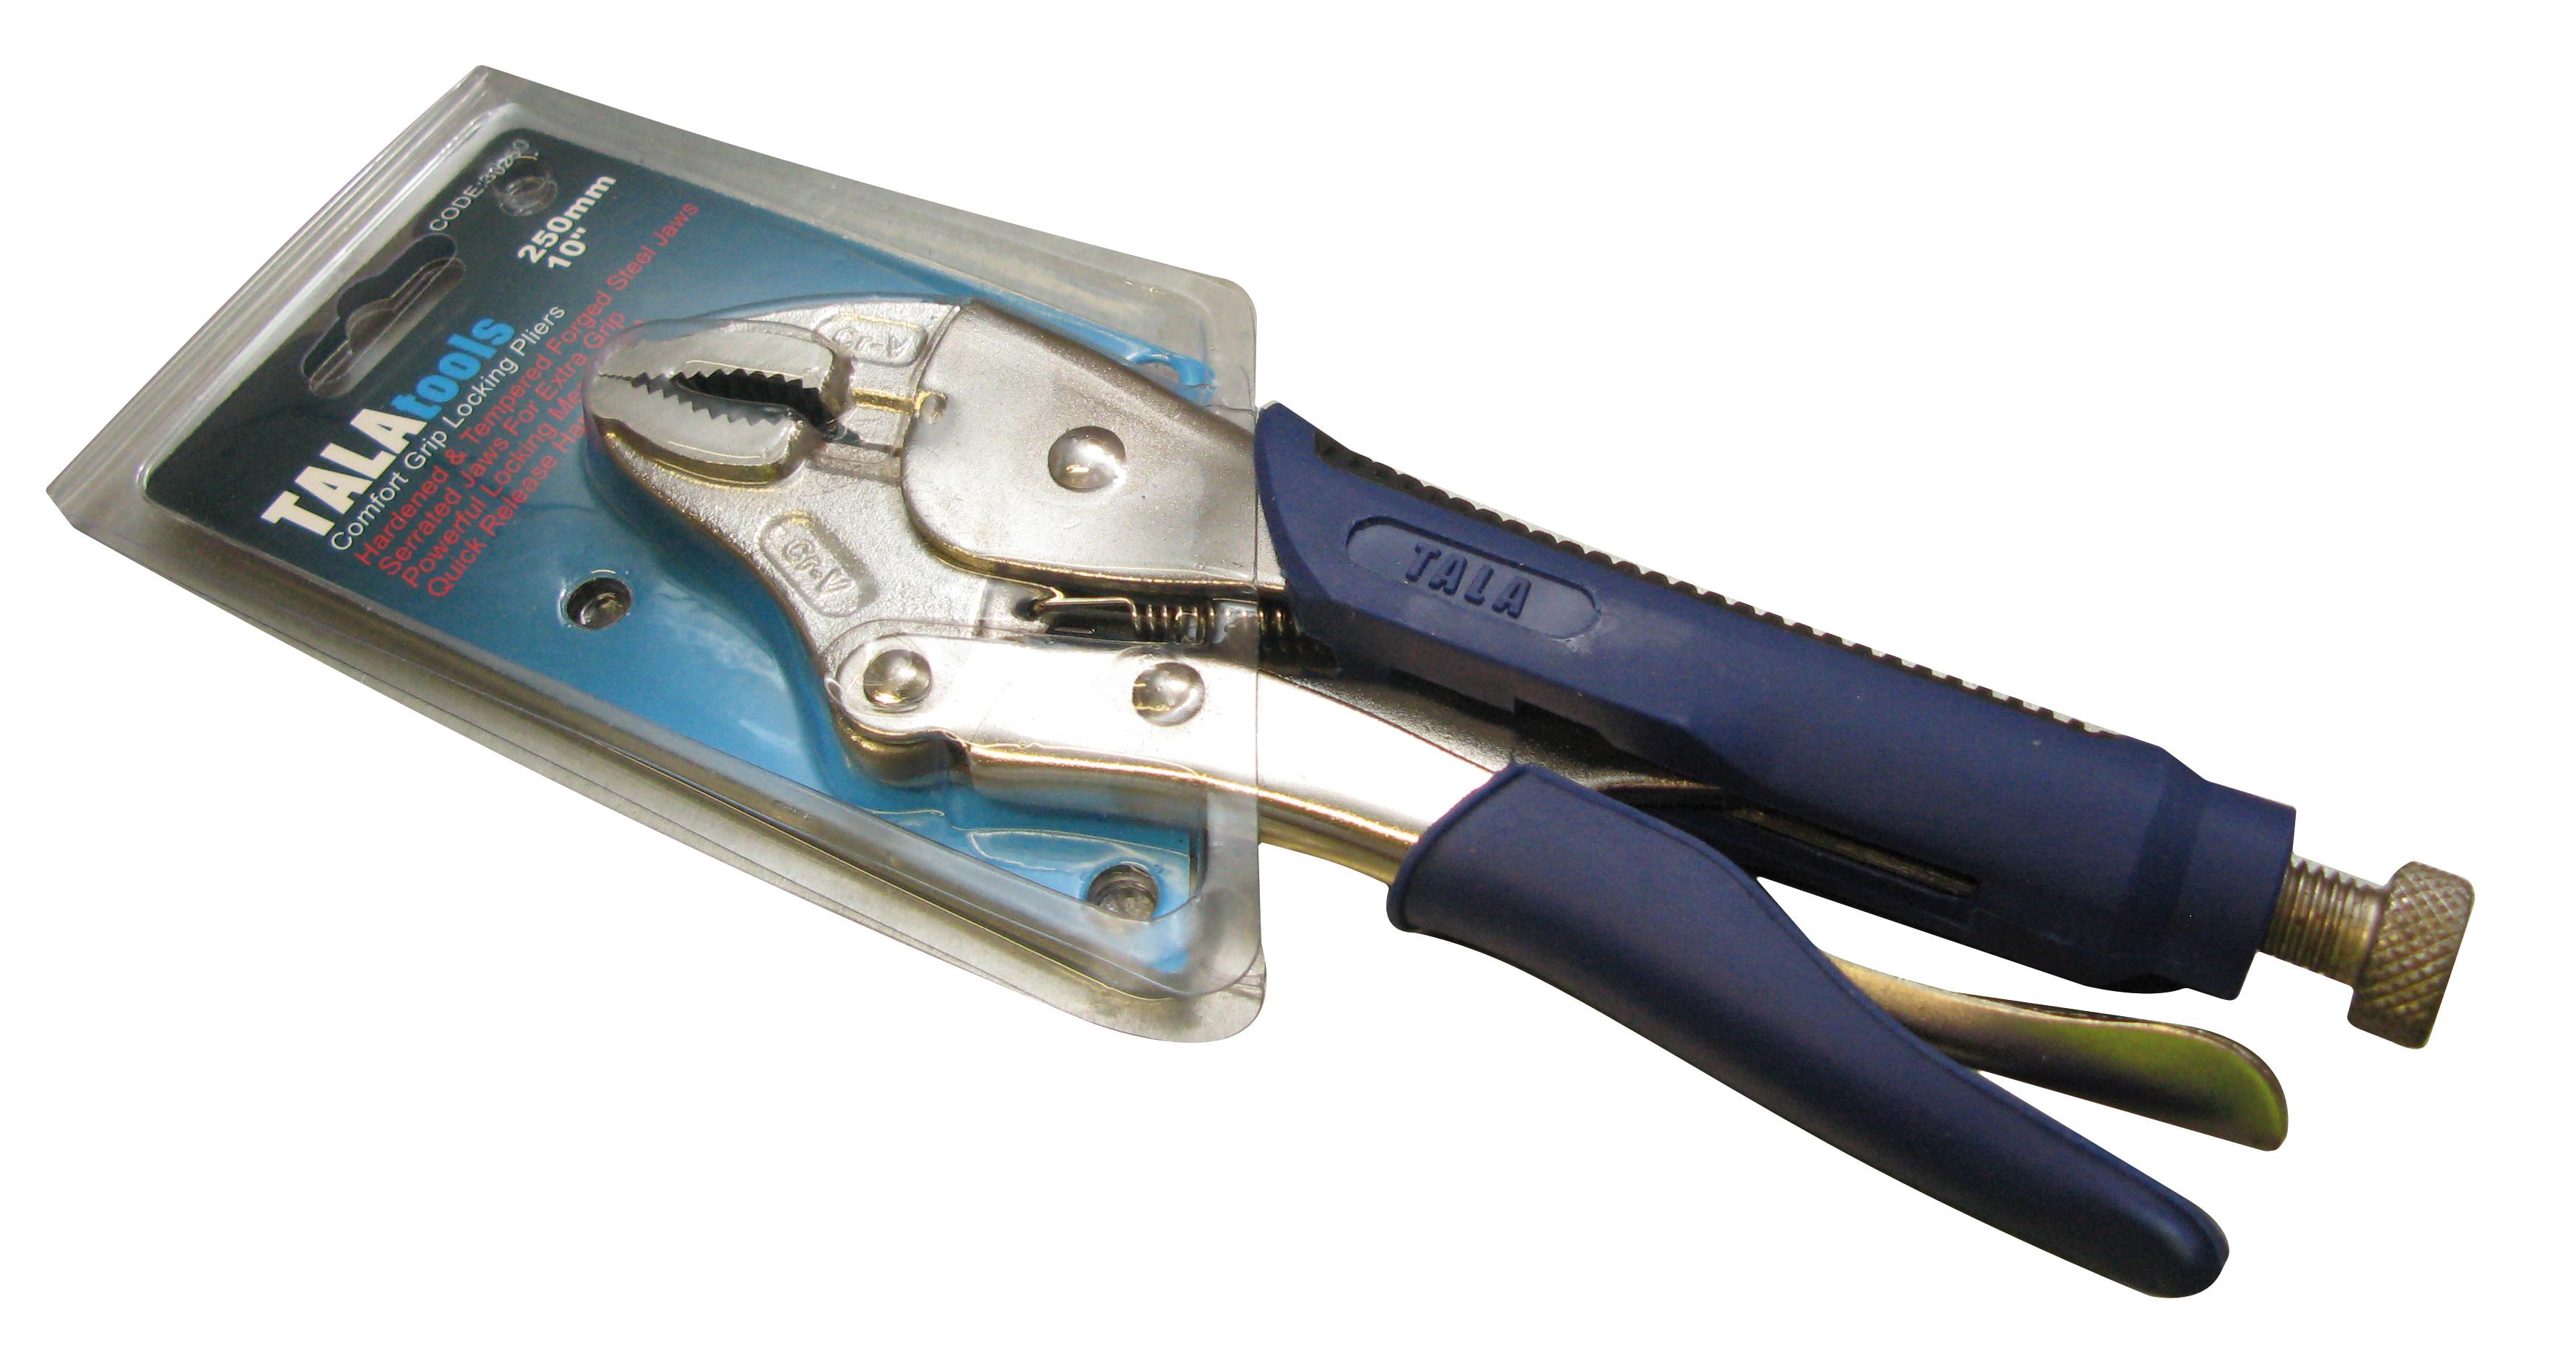 Soft Grip Locking Pliers